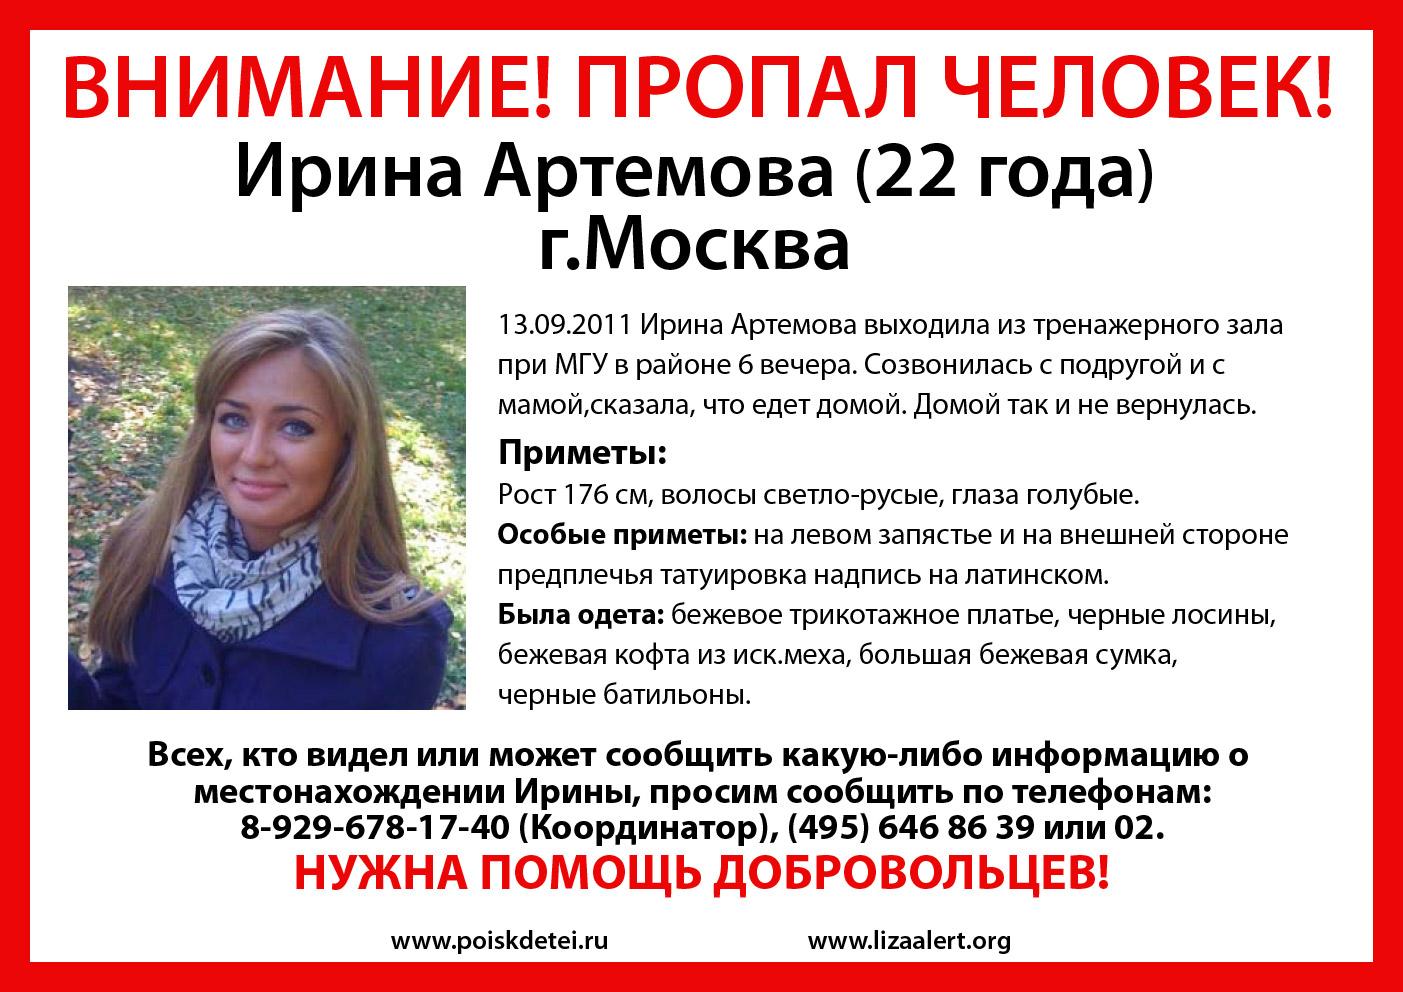 http://stupino-news.ucoz.ru/_nw/61/26309102.jpg